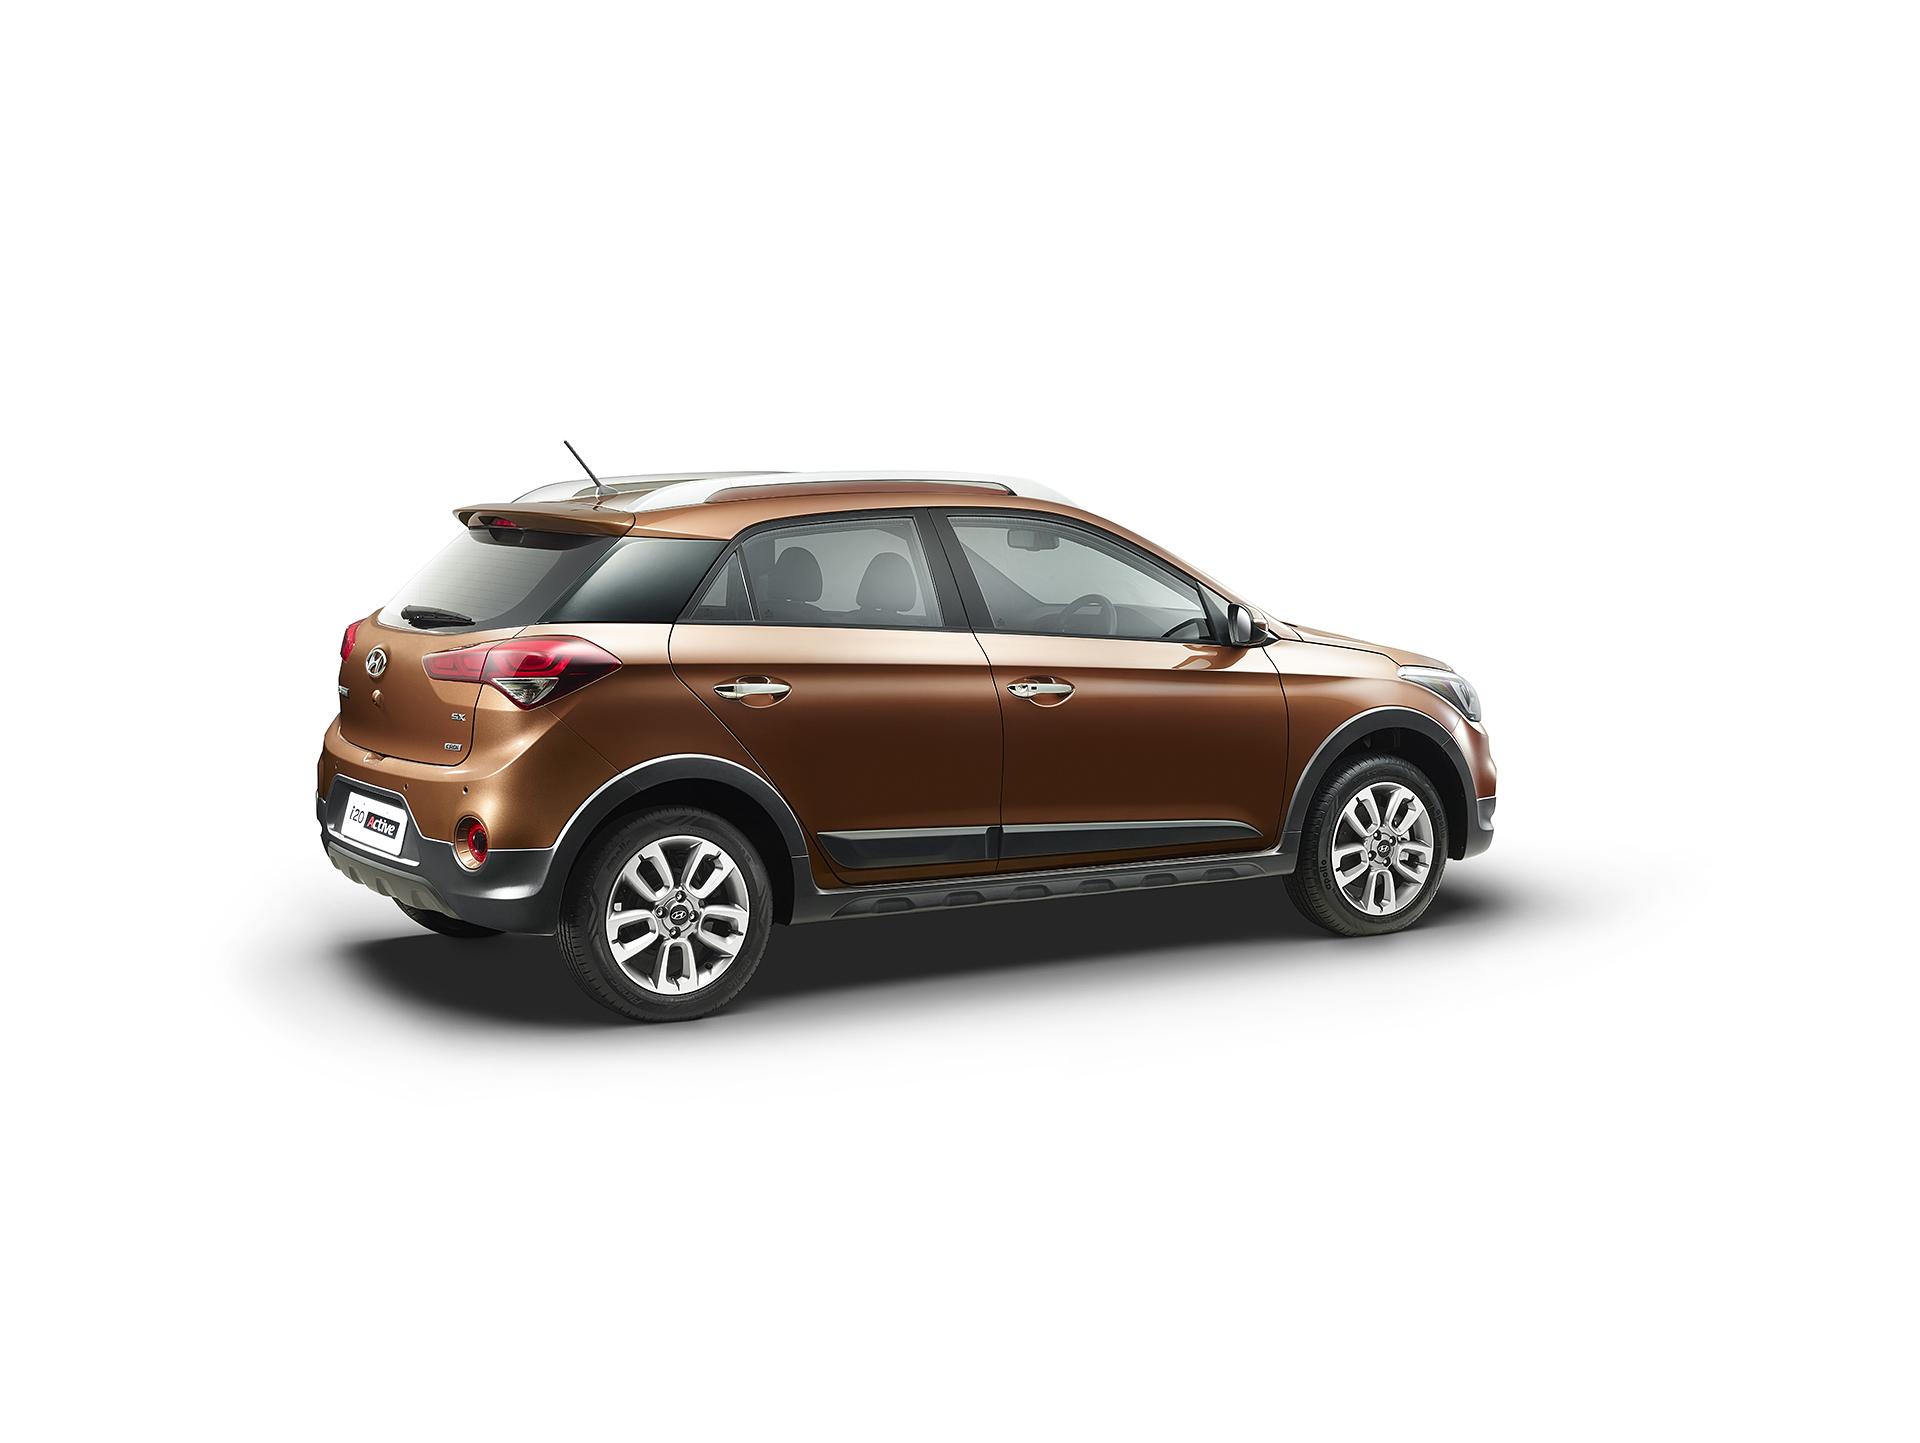 Hyundai i20 Active Brown Studio Rear Med